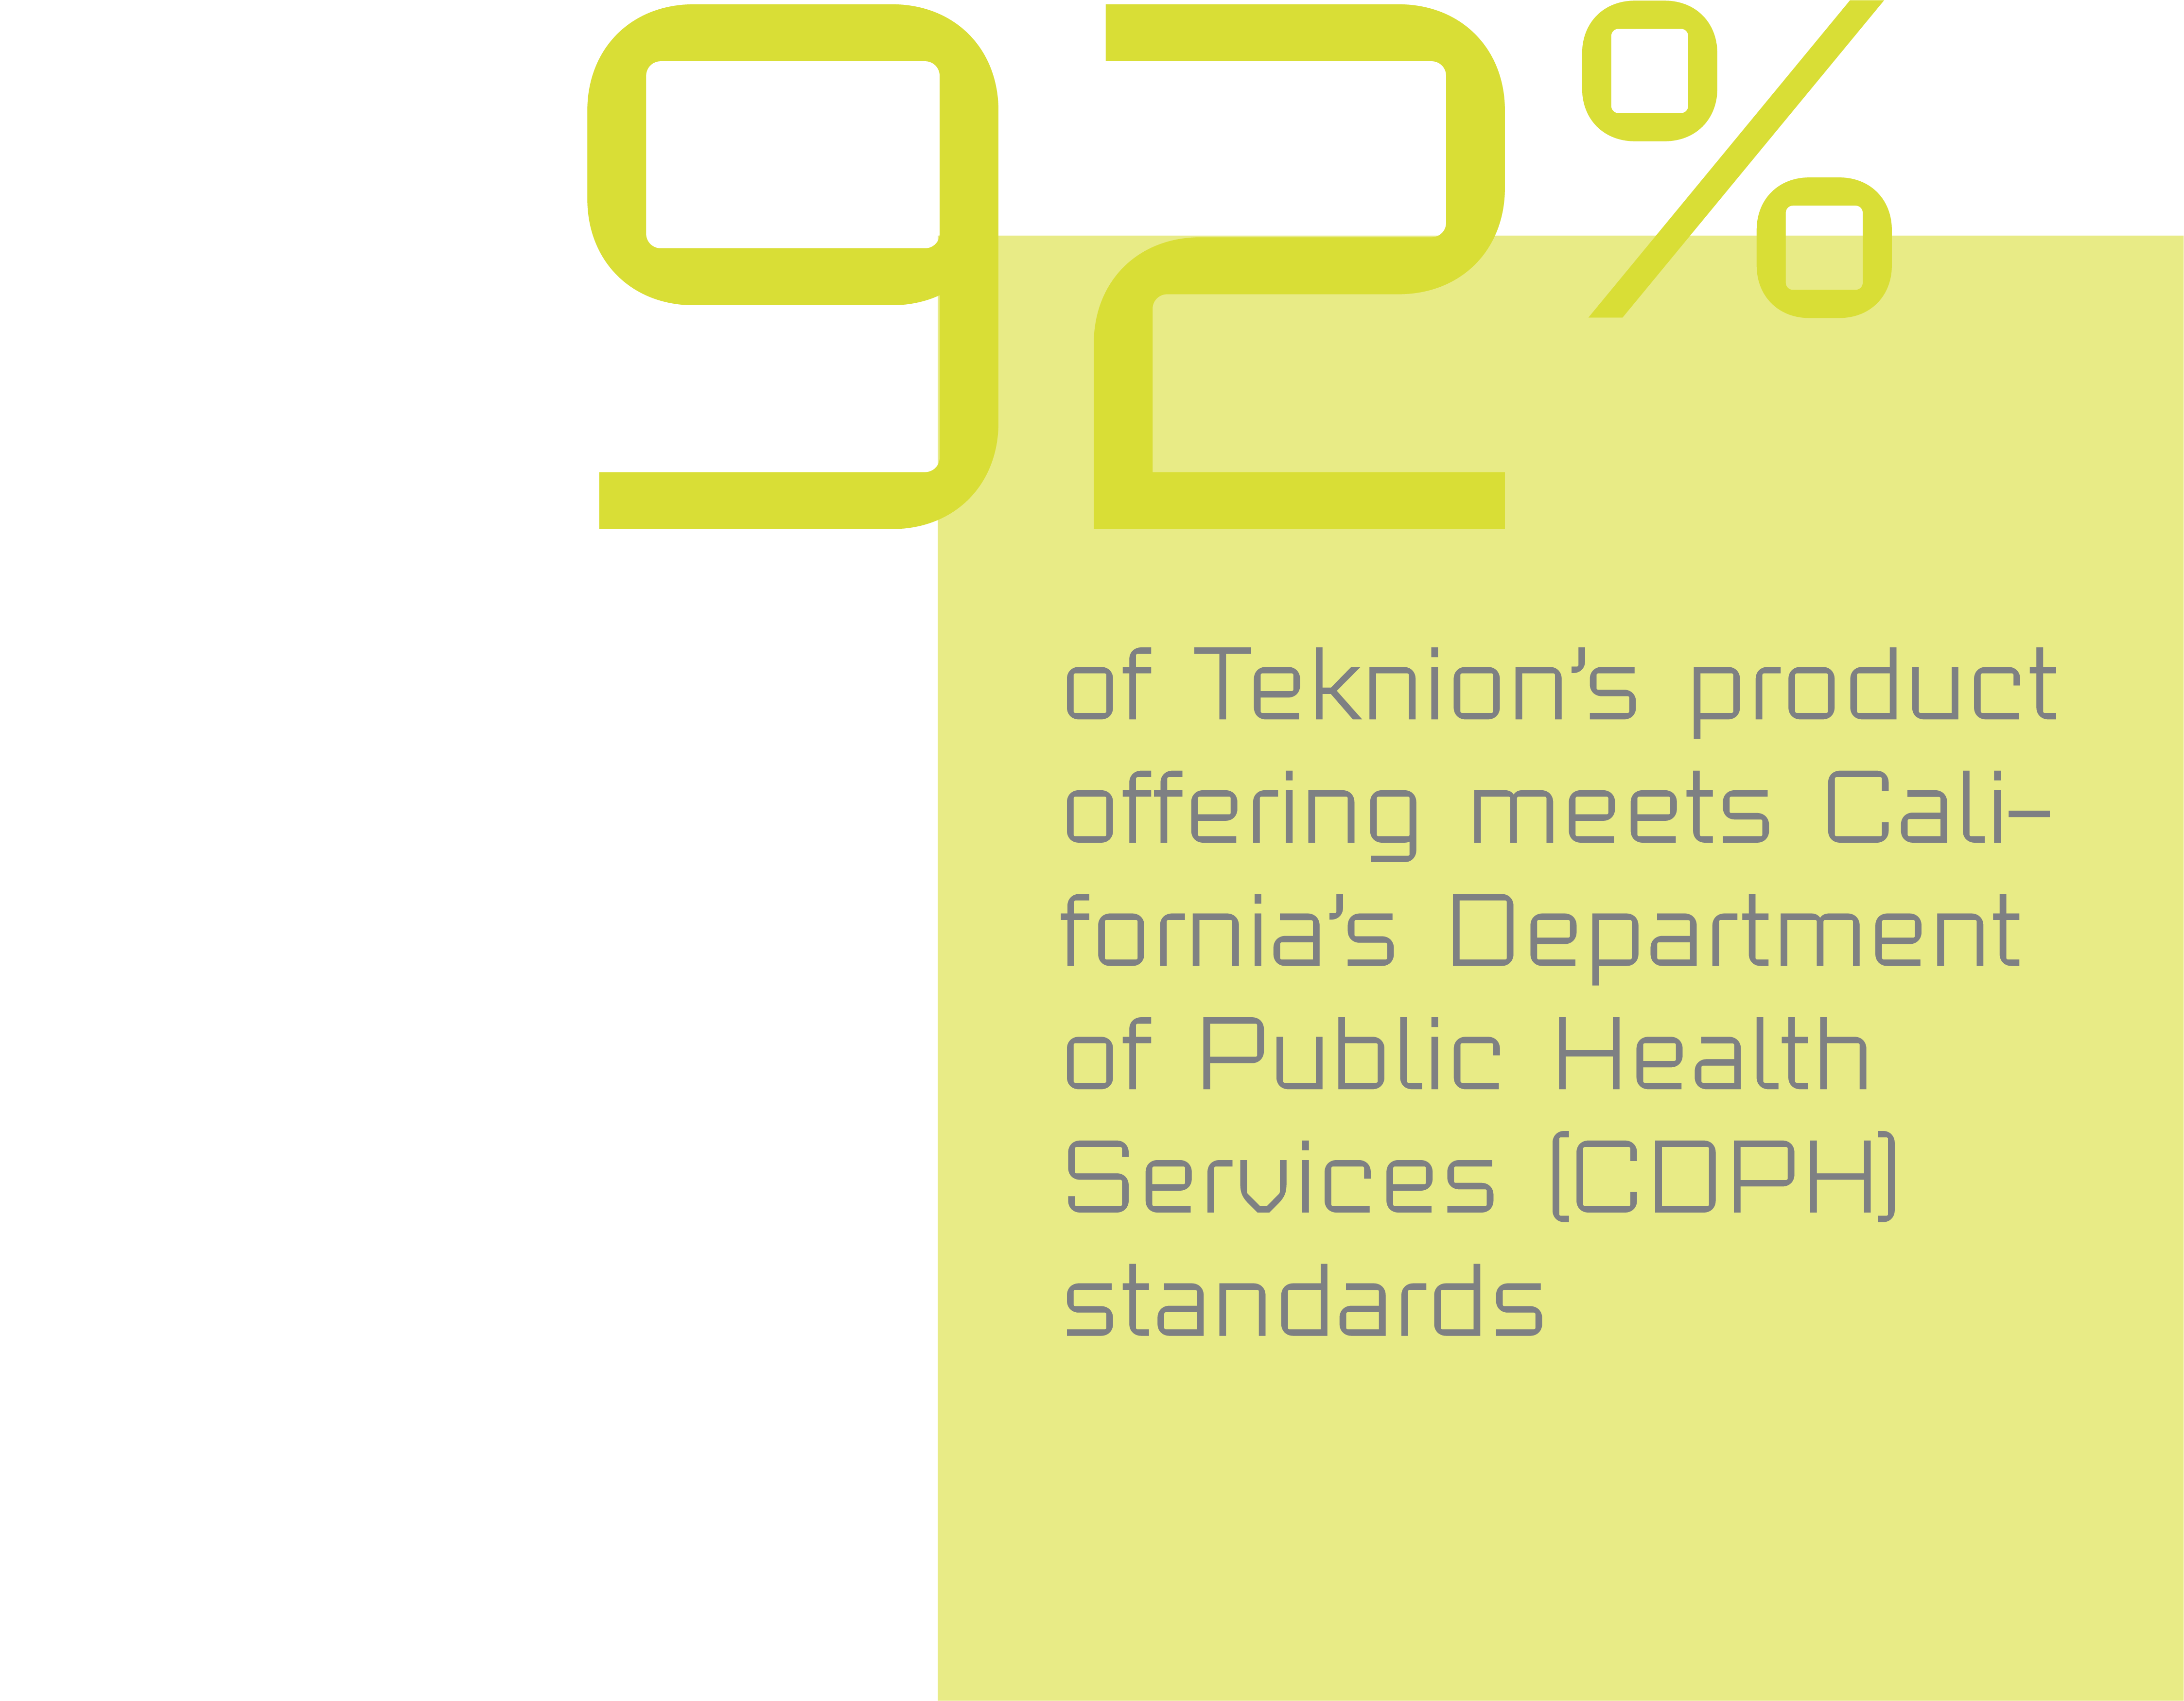 Teknion Image